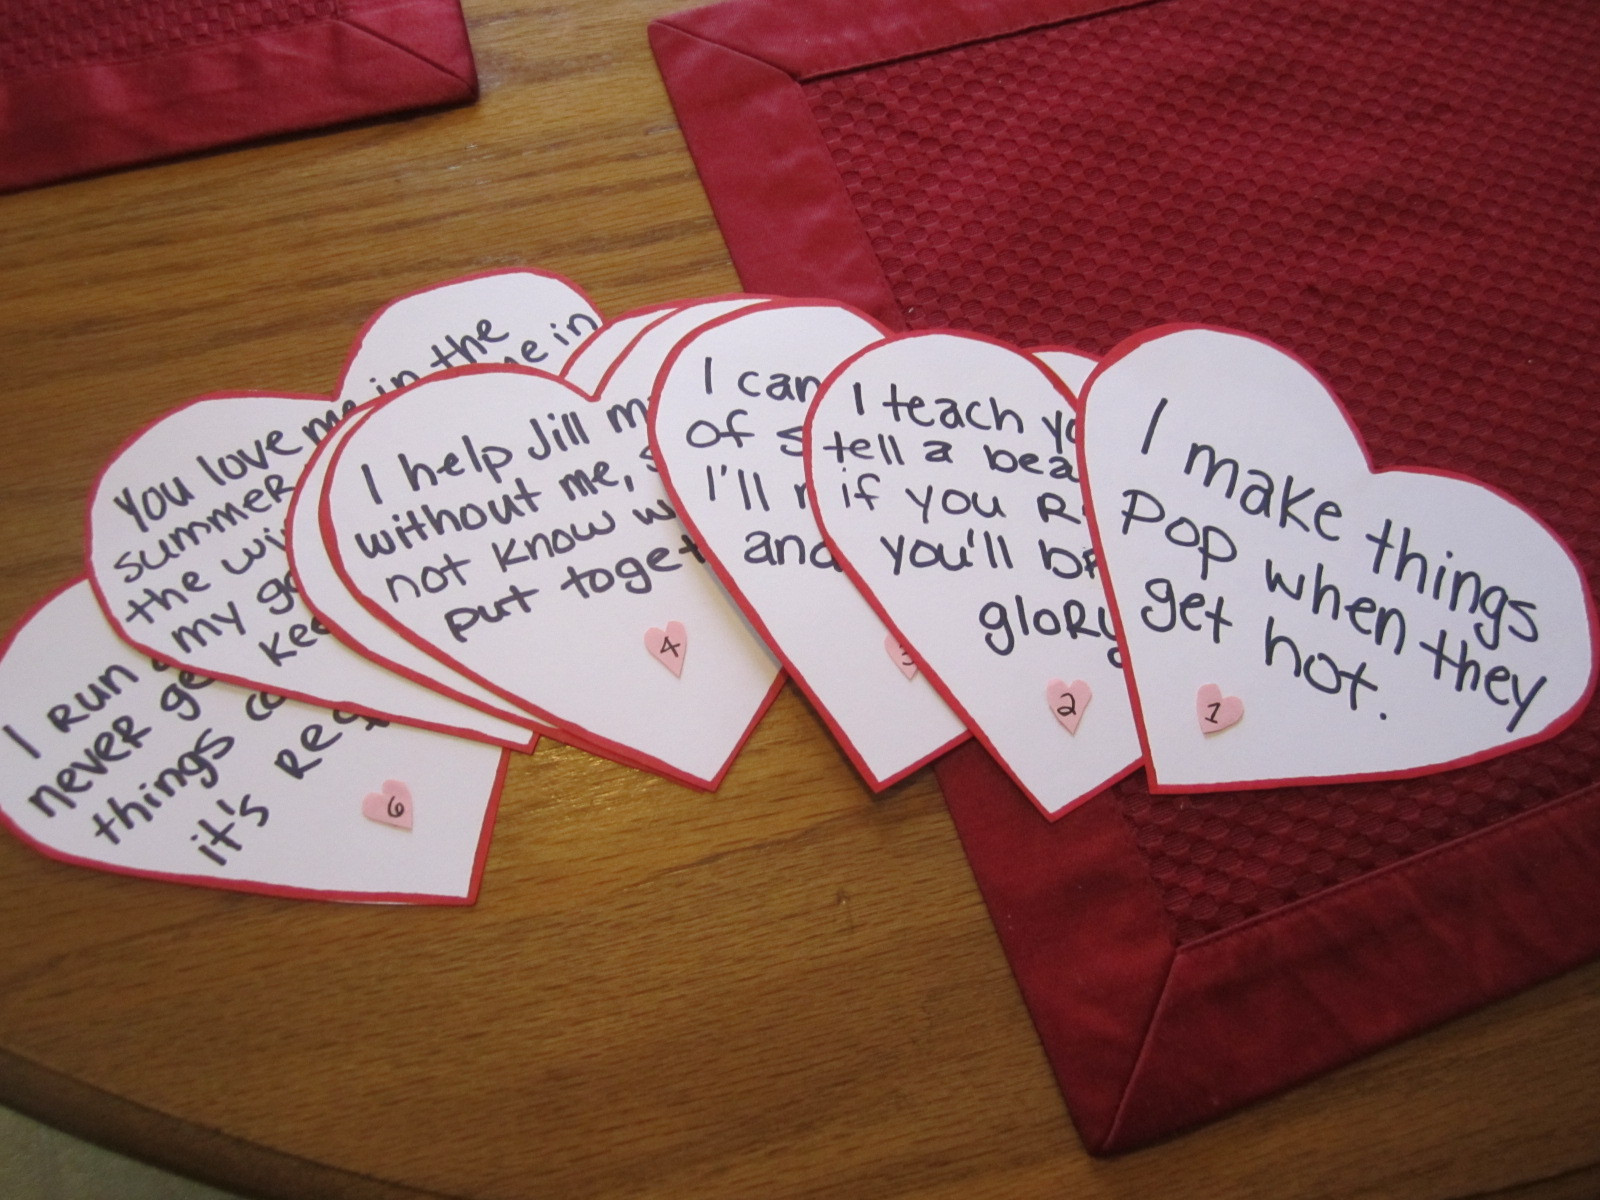 Valentines Day Gifts For Him DIY  Ten DIY Valentine's Day Gifts for him and her